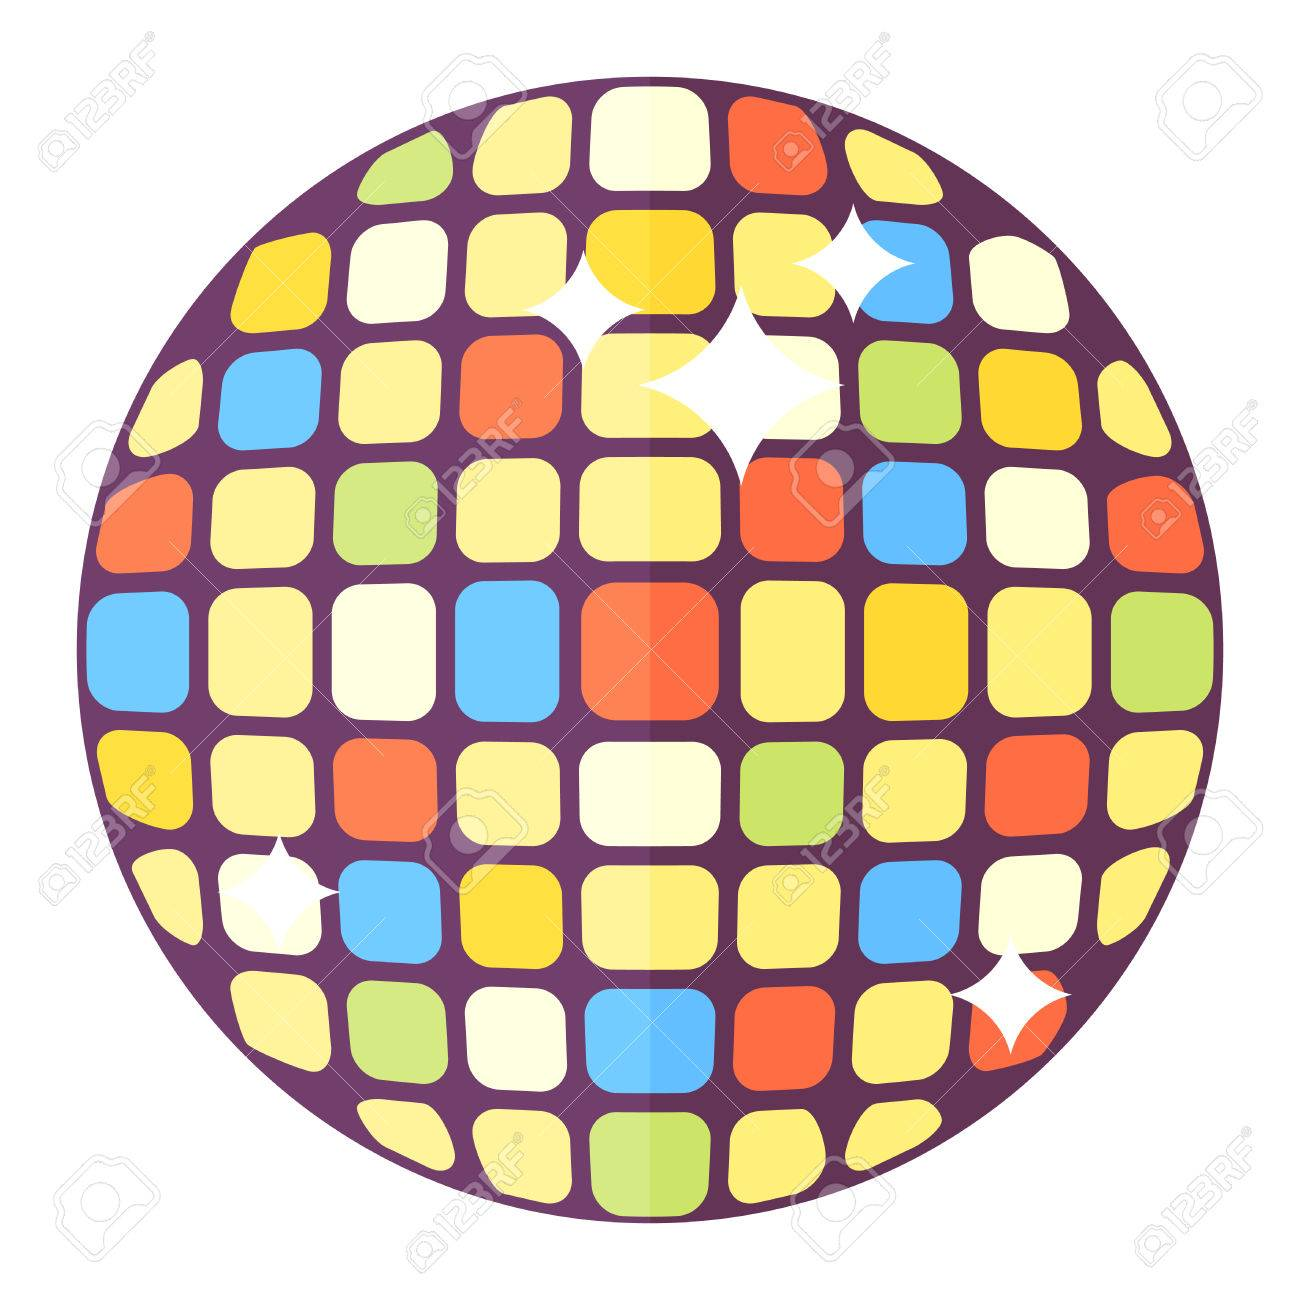 disco ball club sphere glitter retro nightlife vector illustration rh 123rf com disco ball vector download disco ball vector free download